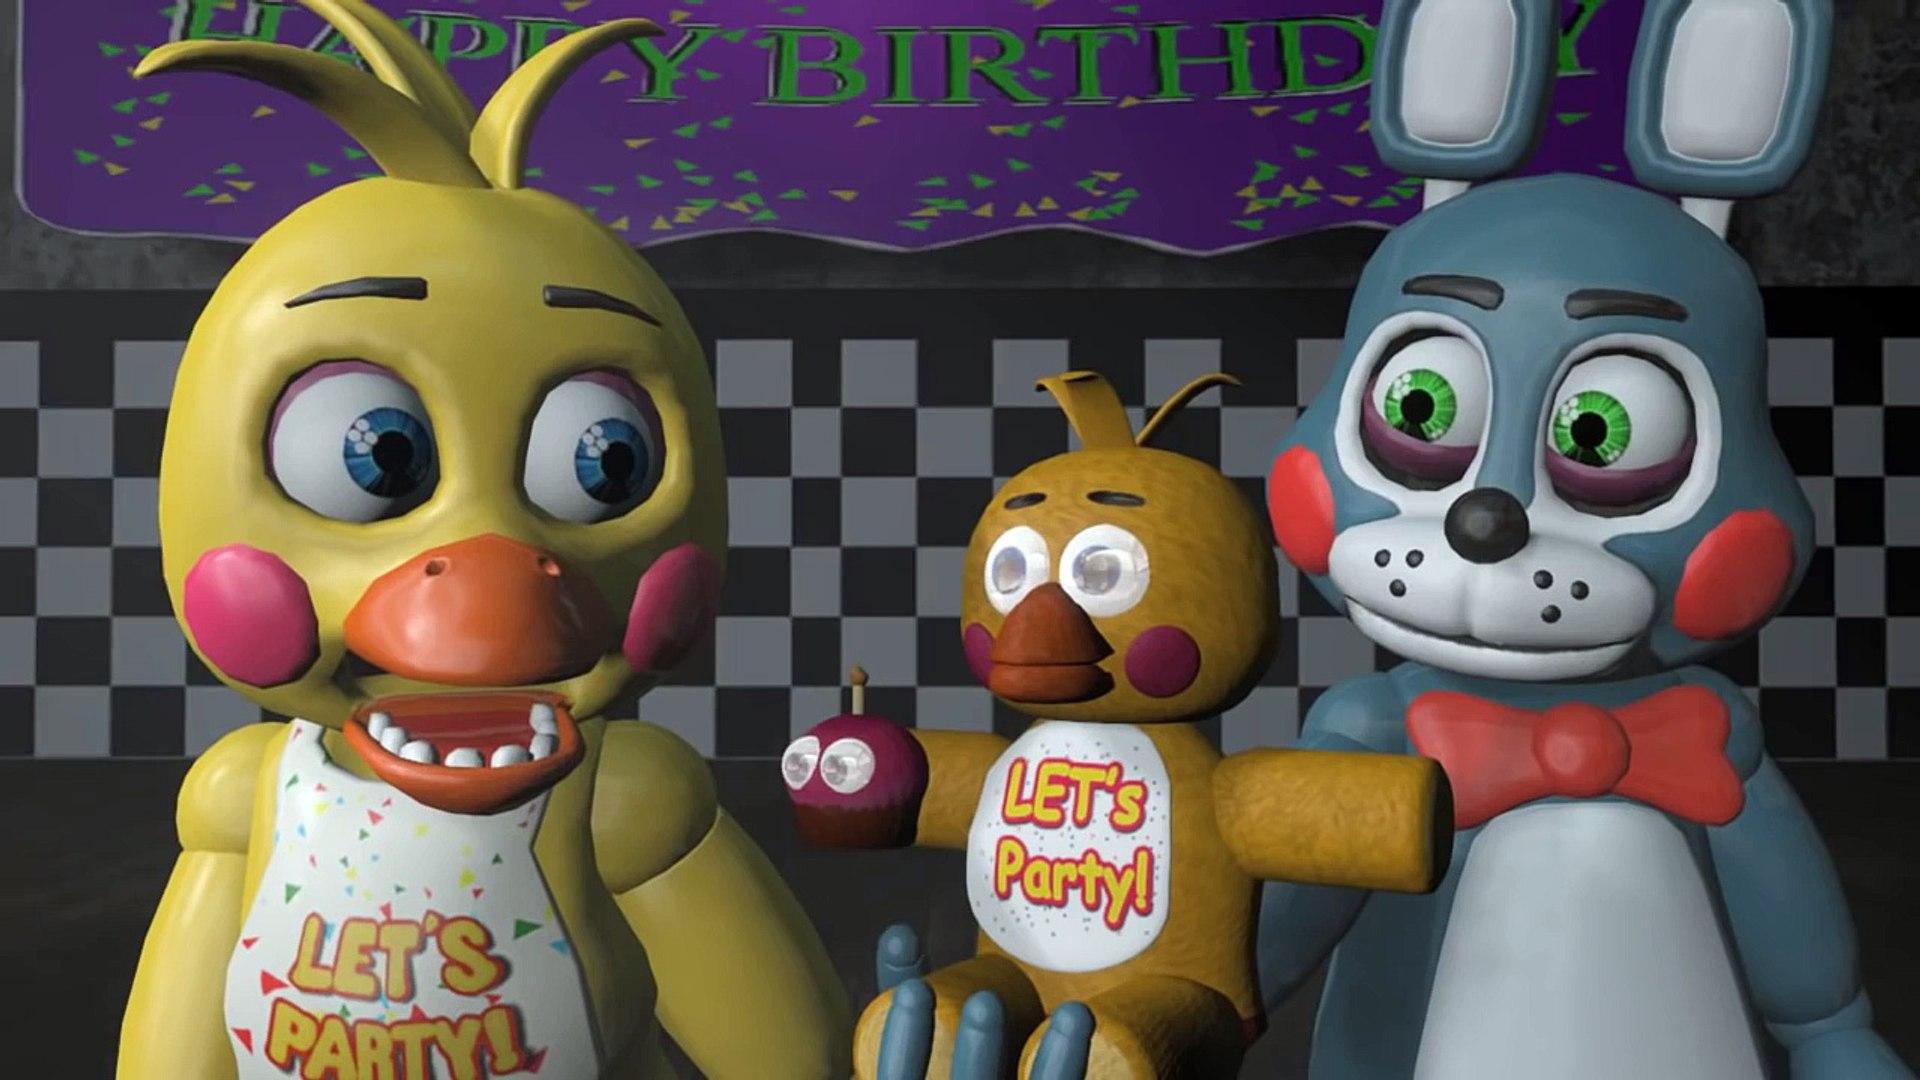 Five Nights At Freddy's Bonnie Animated sfm fnaf: toy bonnie x toy chica (five nights at freddys animation)